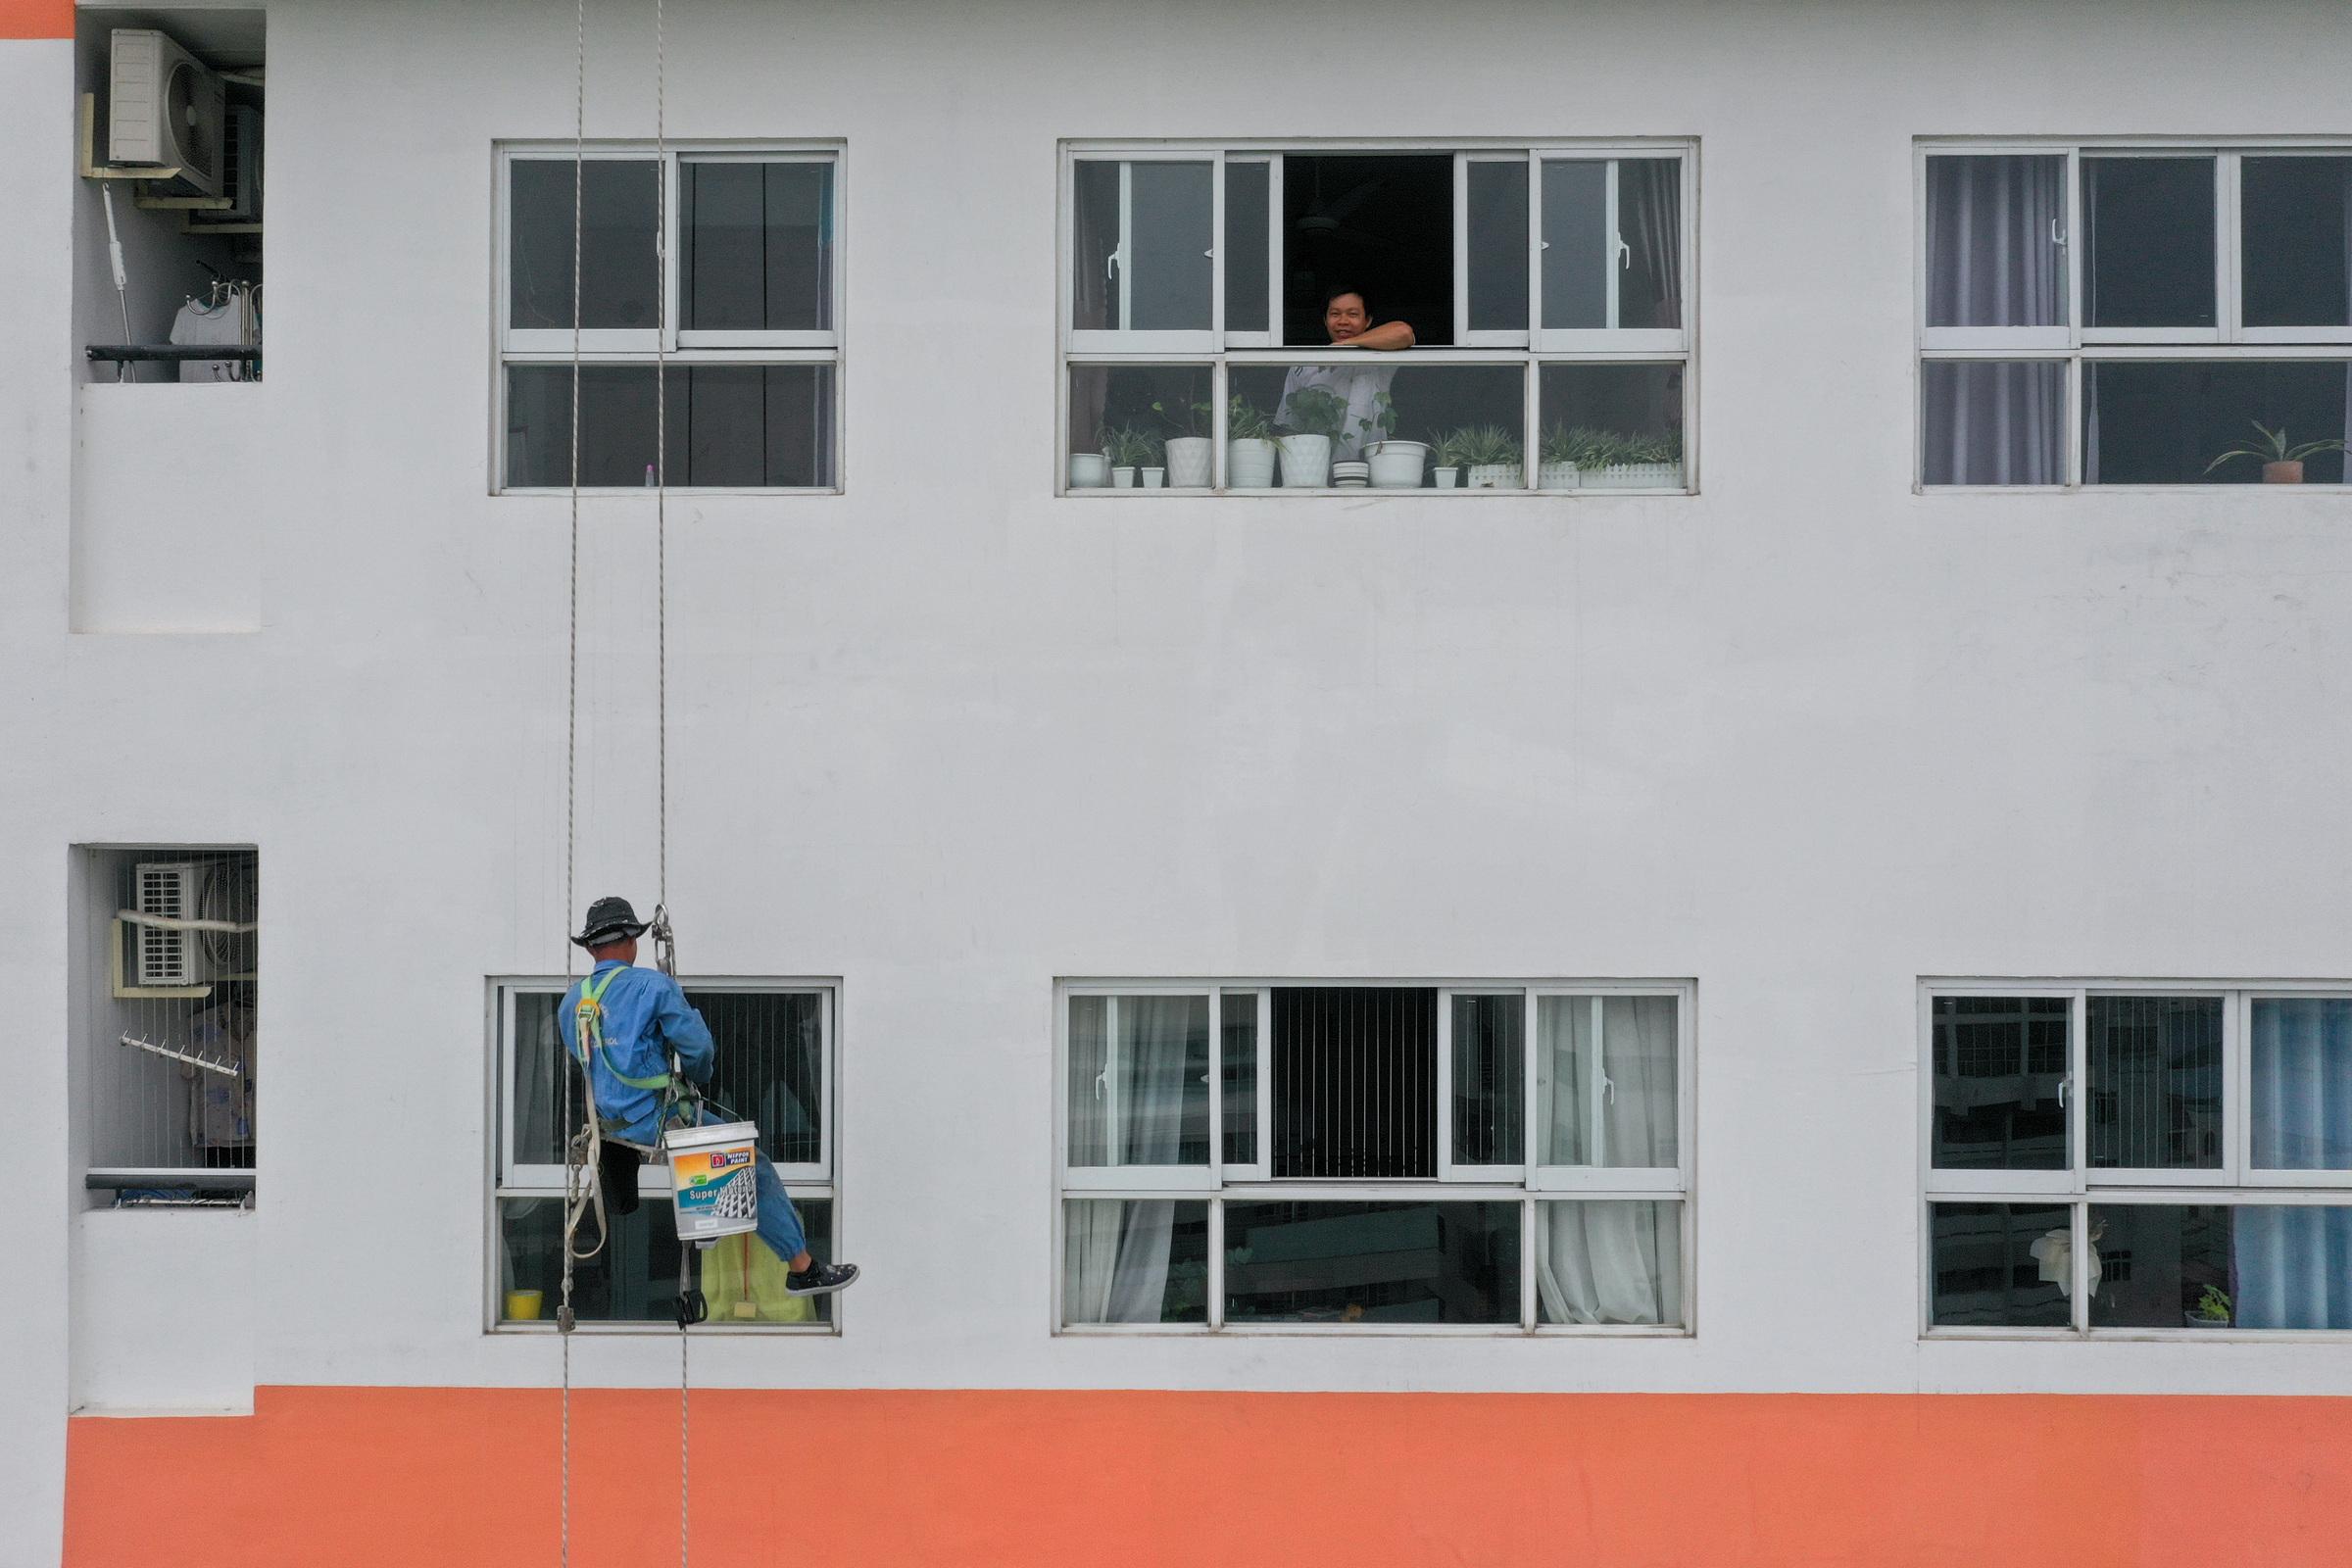 'Spidermen' defy gravity, death to clean Saigon skyscraper windows